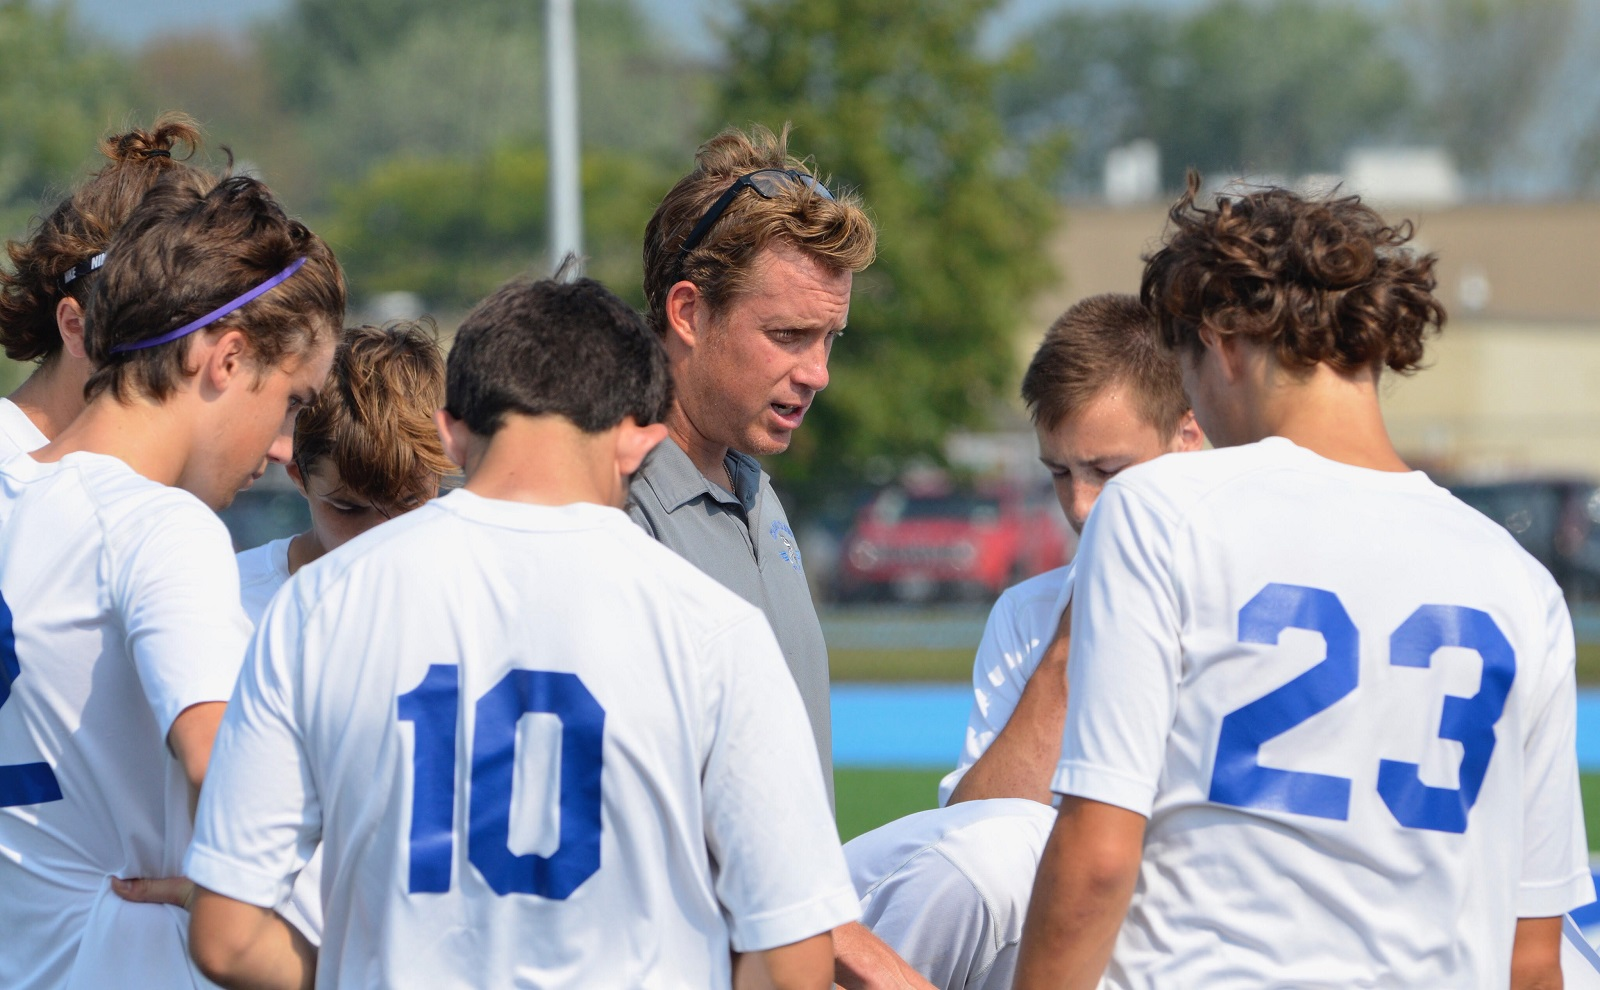 Frank Butcher, head coach of Grand Island's boys team, has recently been named head coach of FC Buffalo. (JT Tompkins)